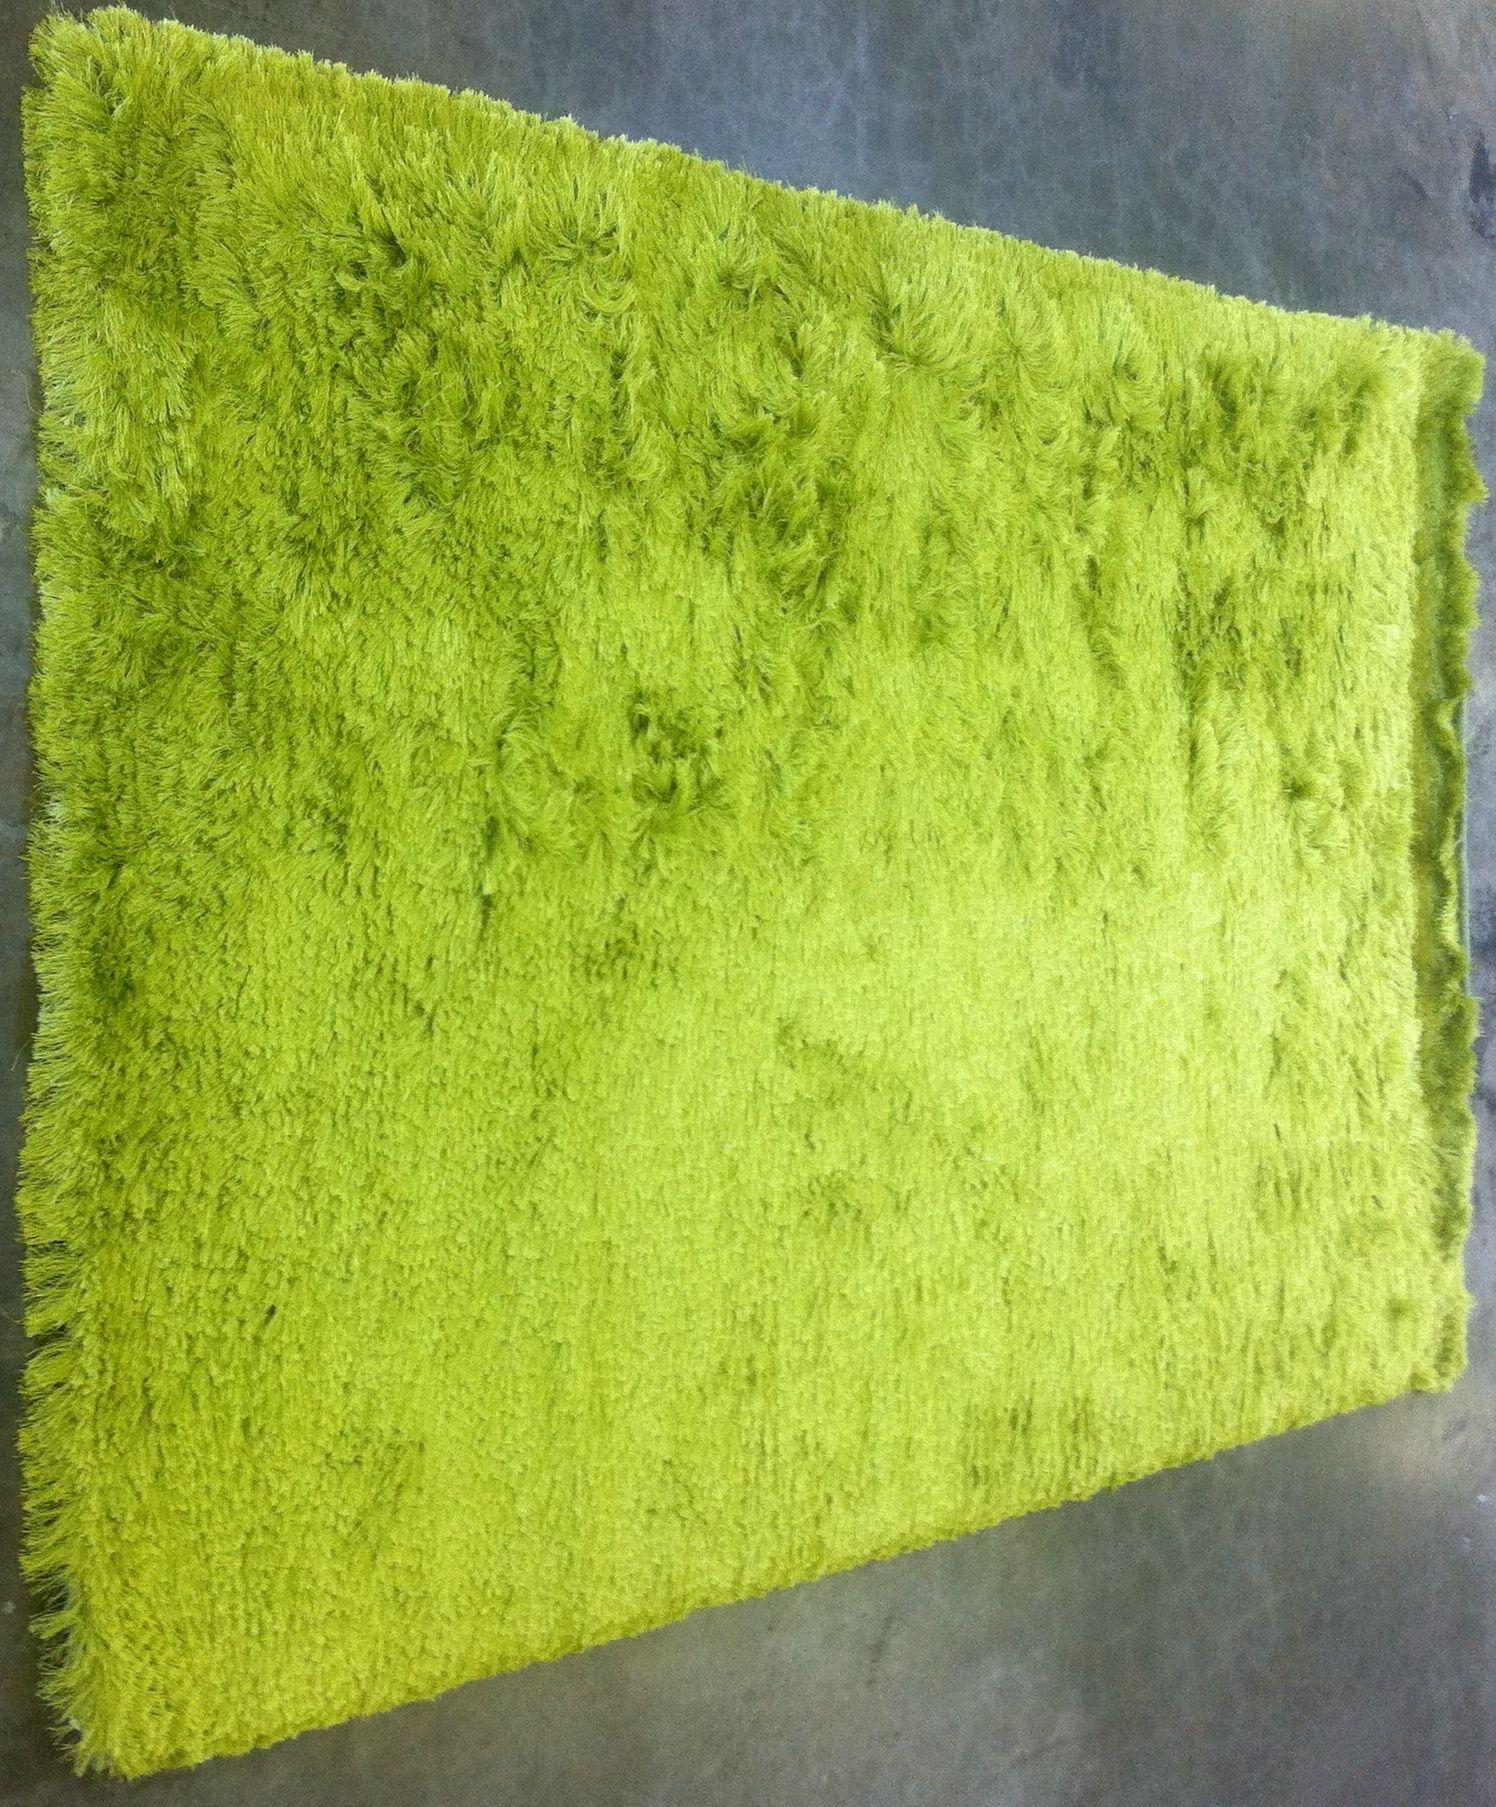 Lime Green Shag Rug Tessa' Decked Dorm Decor